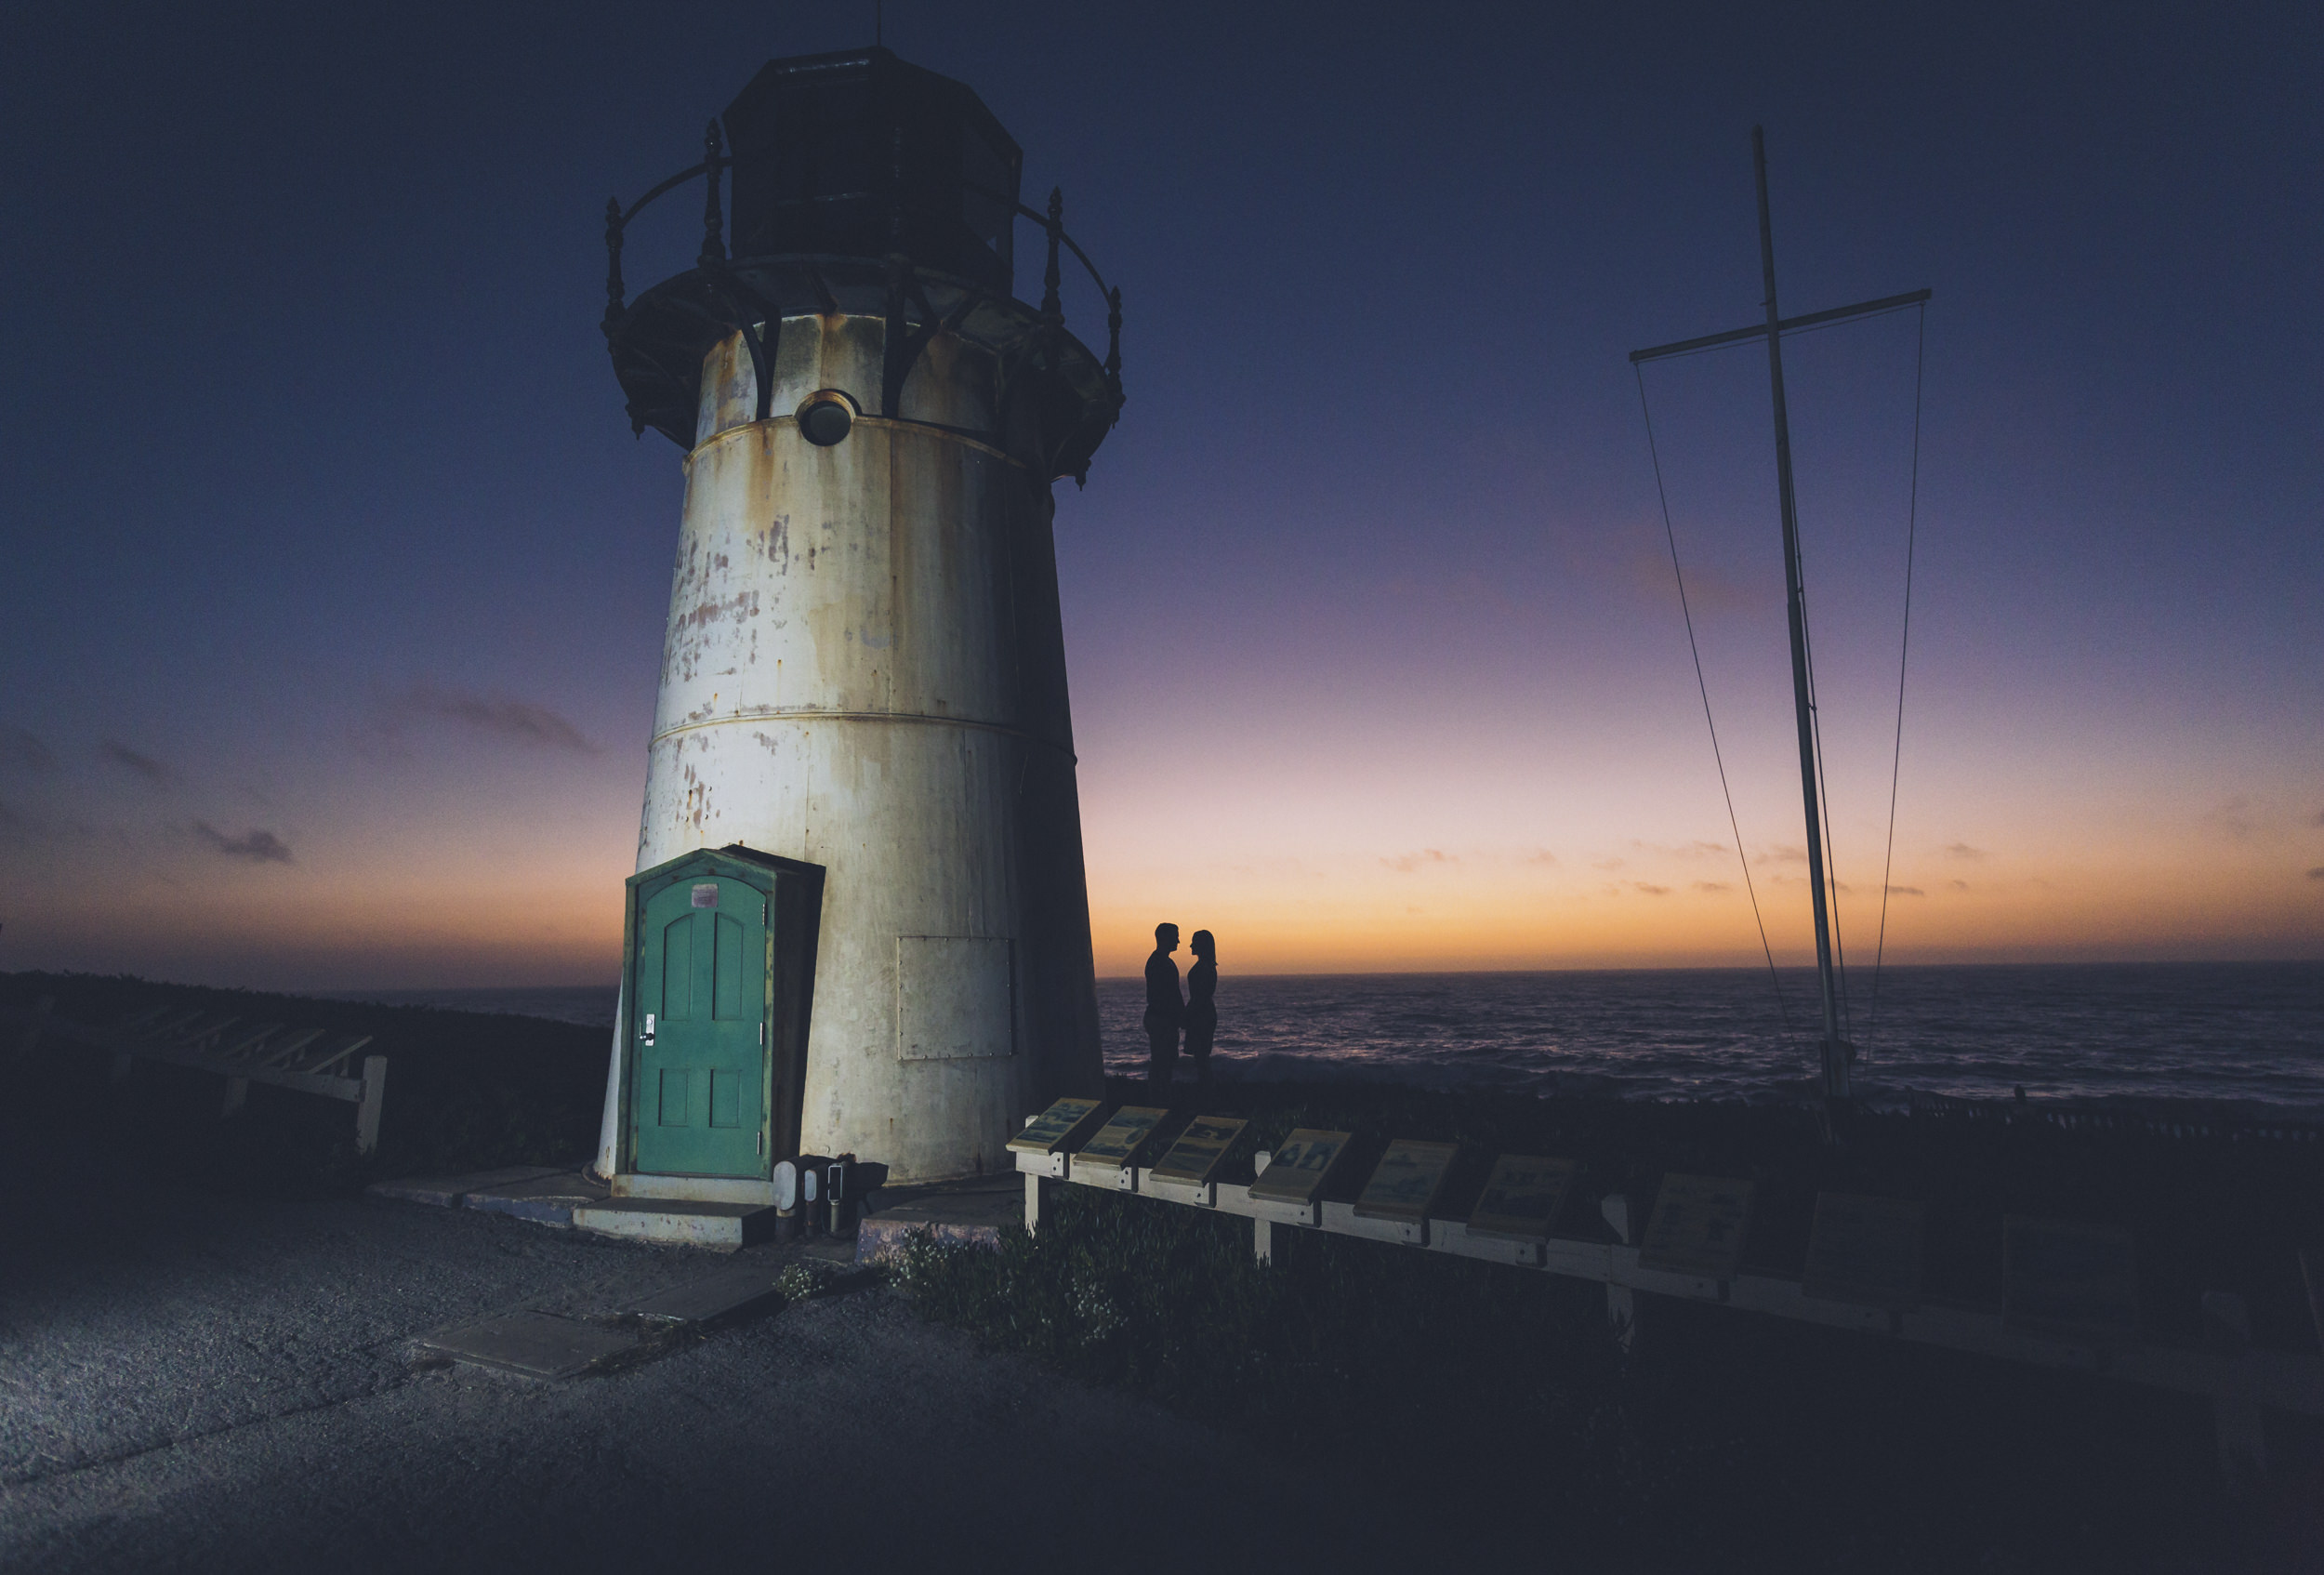 lighthouse-engagement-session-sunsete-california-2.jpg